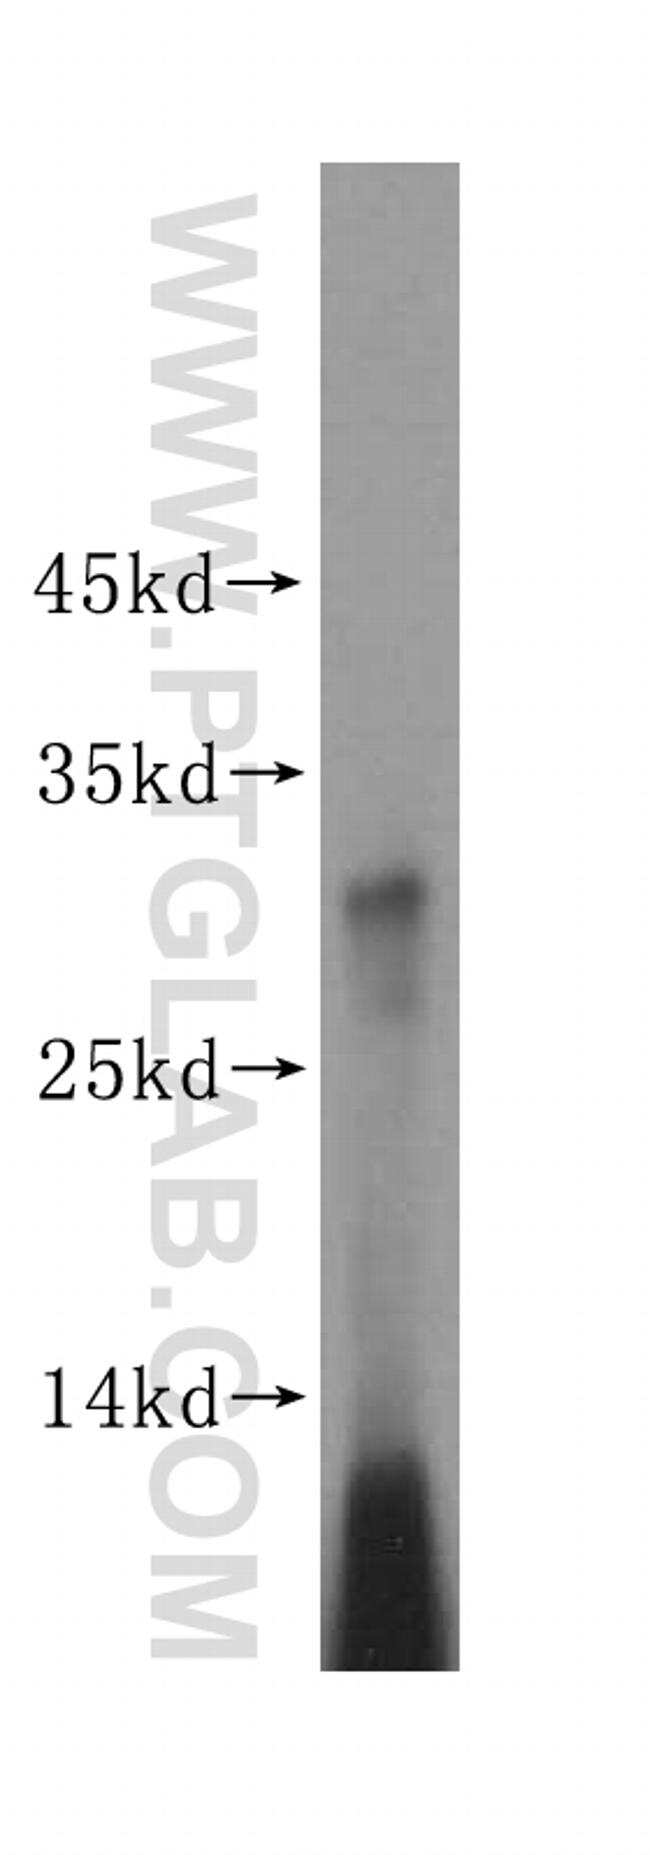 MRPS15 Antibody in Western Blot (WB)